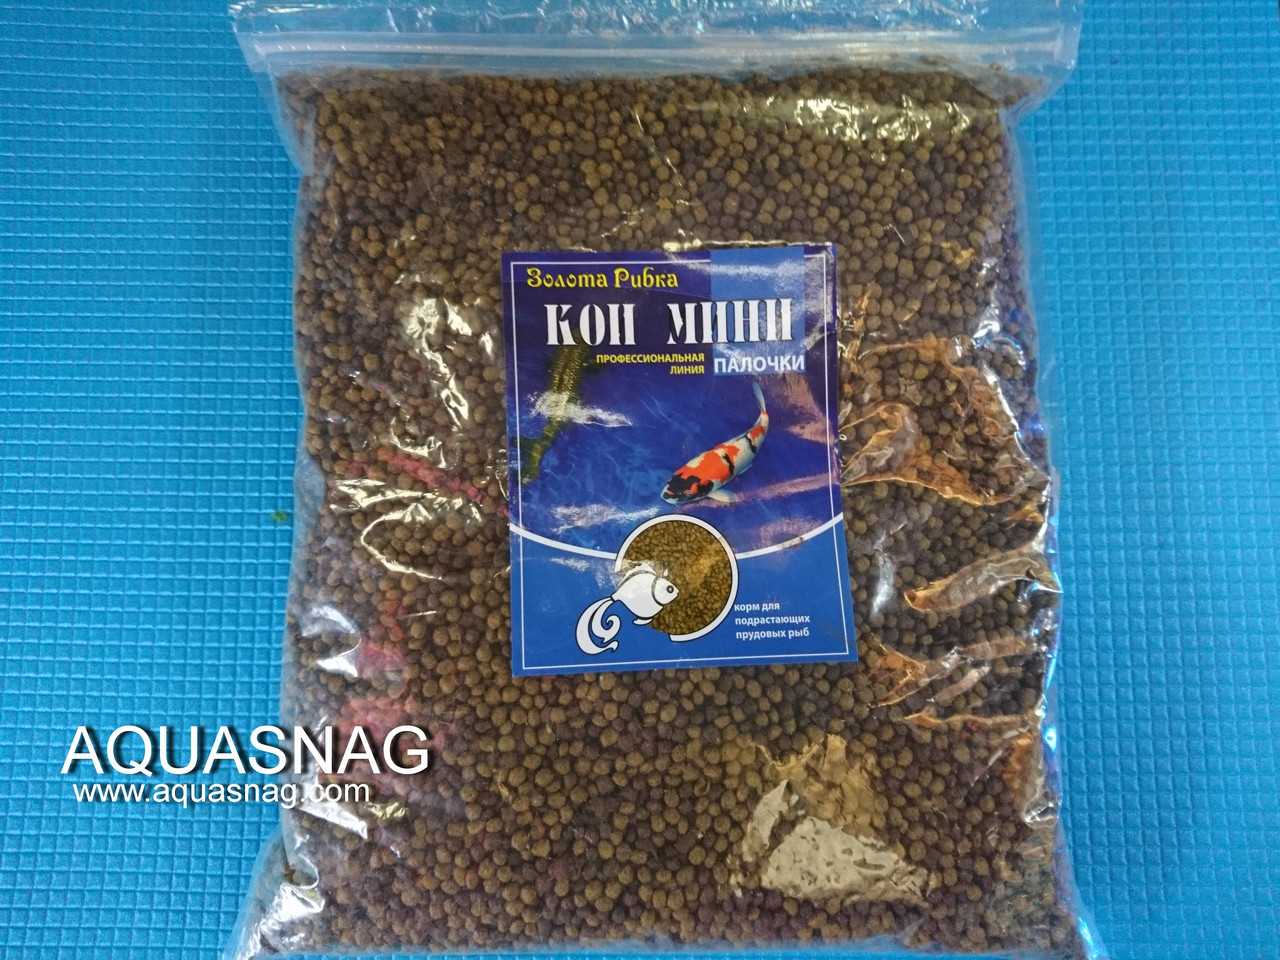 Кои Мини, шарики-1кг, основной, витаминизированный корм для молоди карпов кои.